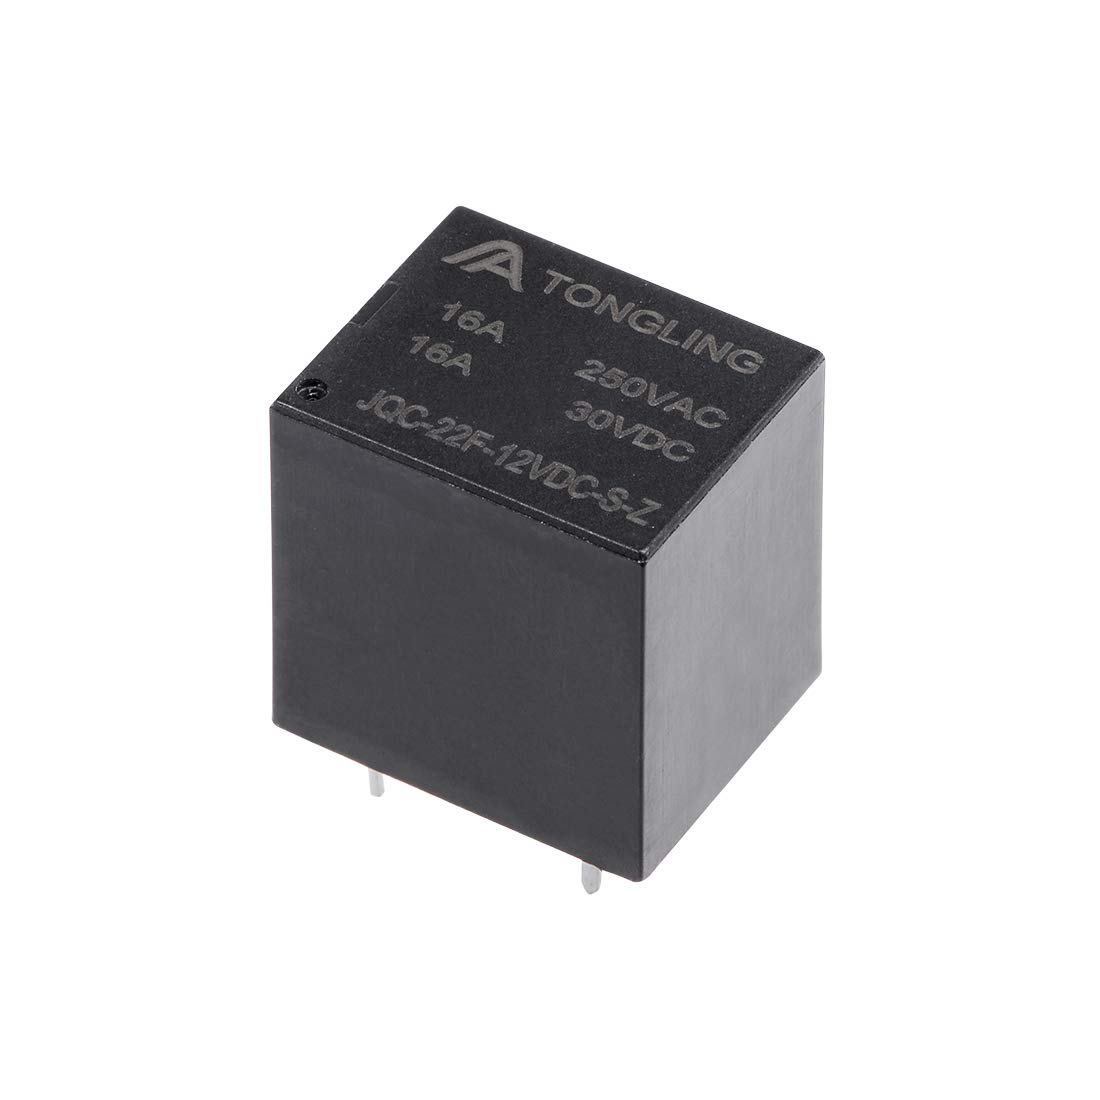 uxcell 1 Pcs JQC-22F-12VDC-S-Z DC 12V Coil SPDT 5 Pin PCB Electromagnetic Power Relay NO+NC